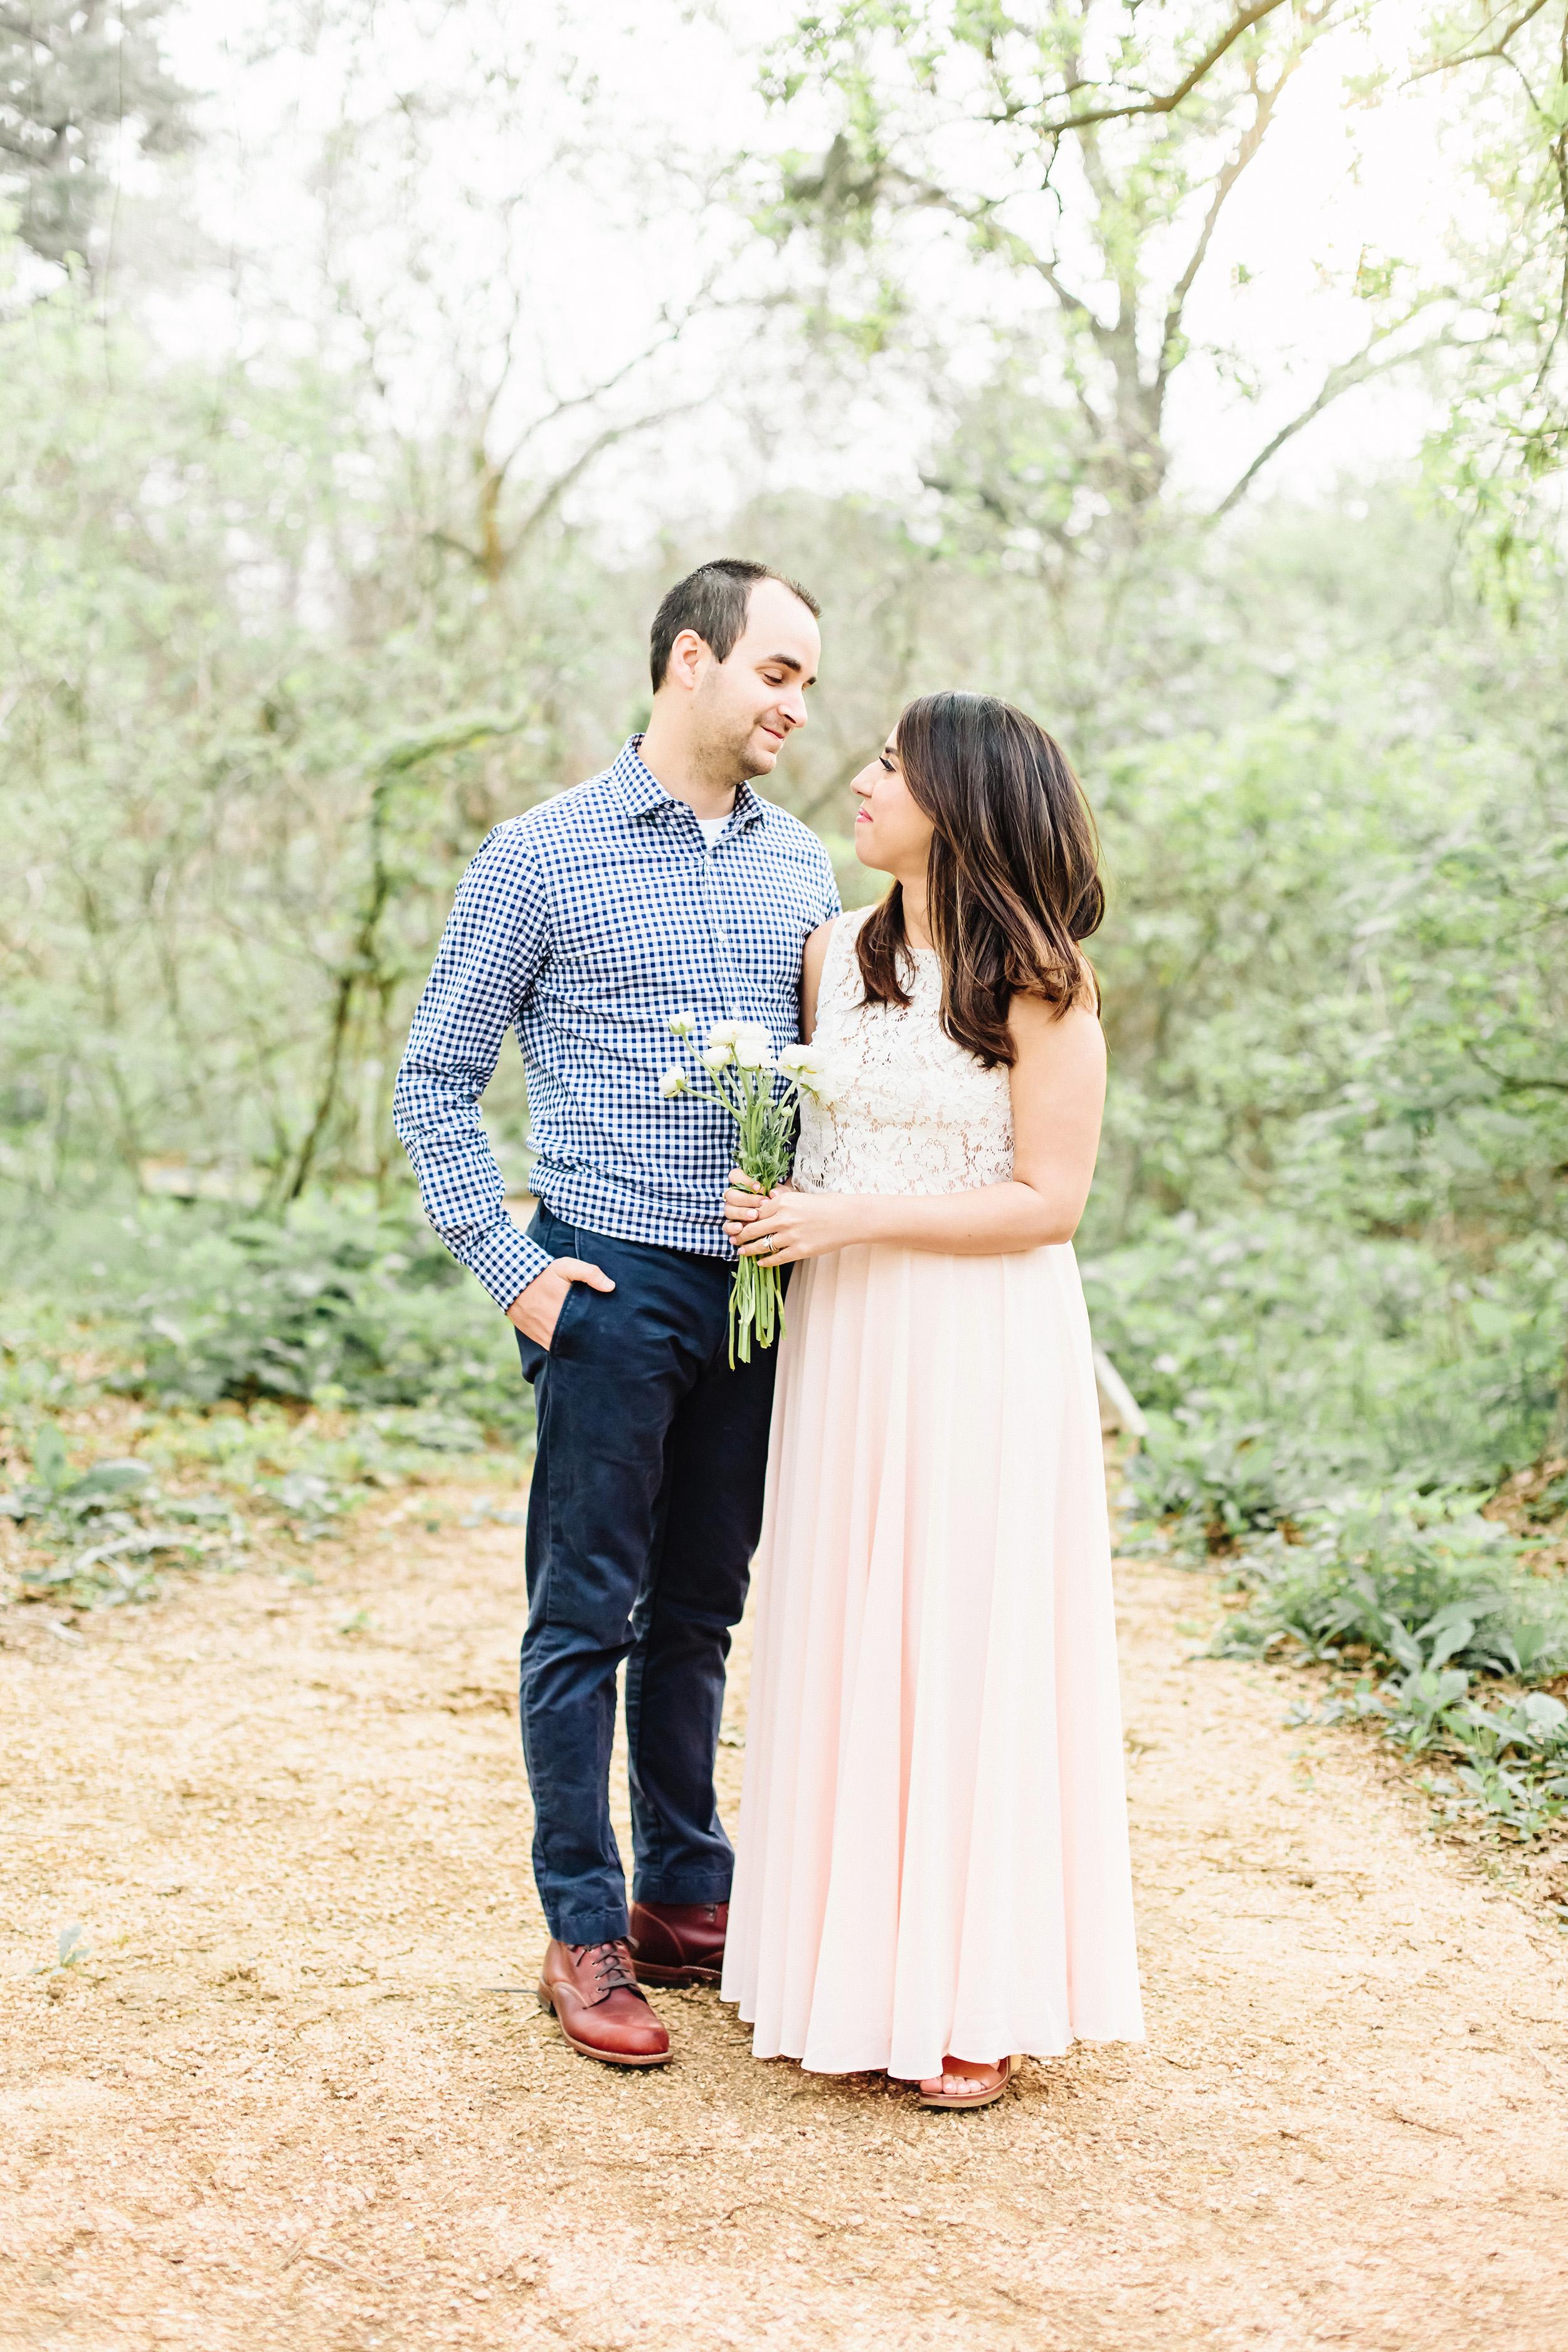 Cassie Schott Photography_Houston Couple Photography_Love Letter Session_10.jpg